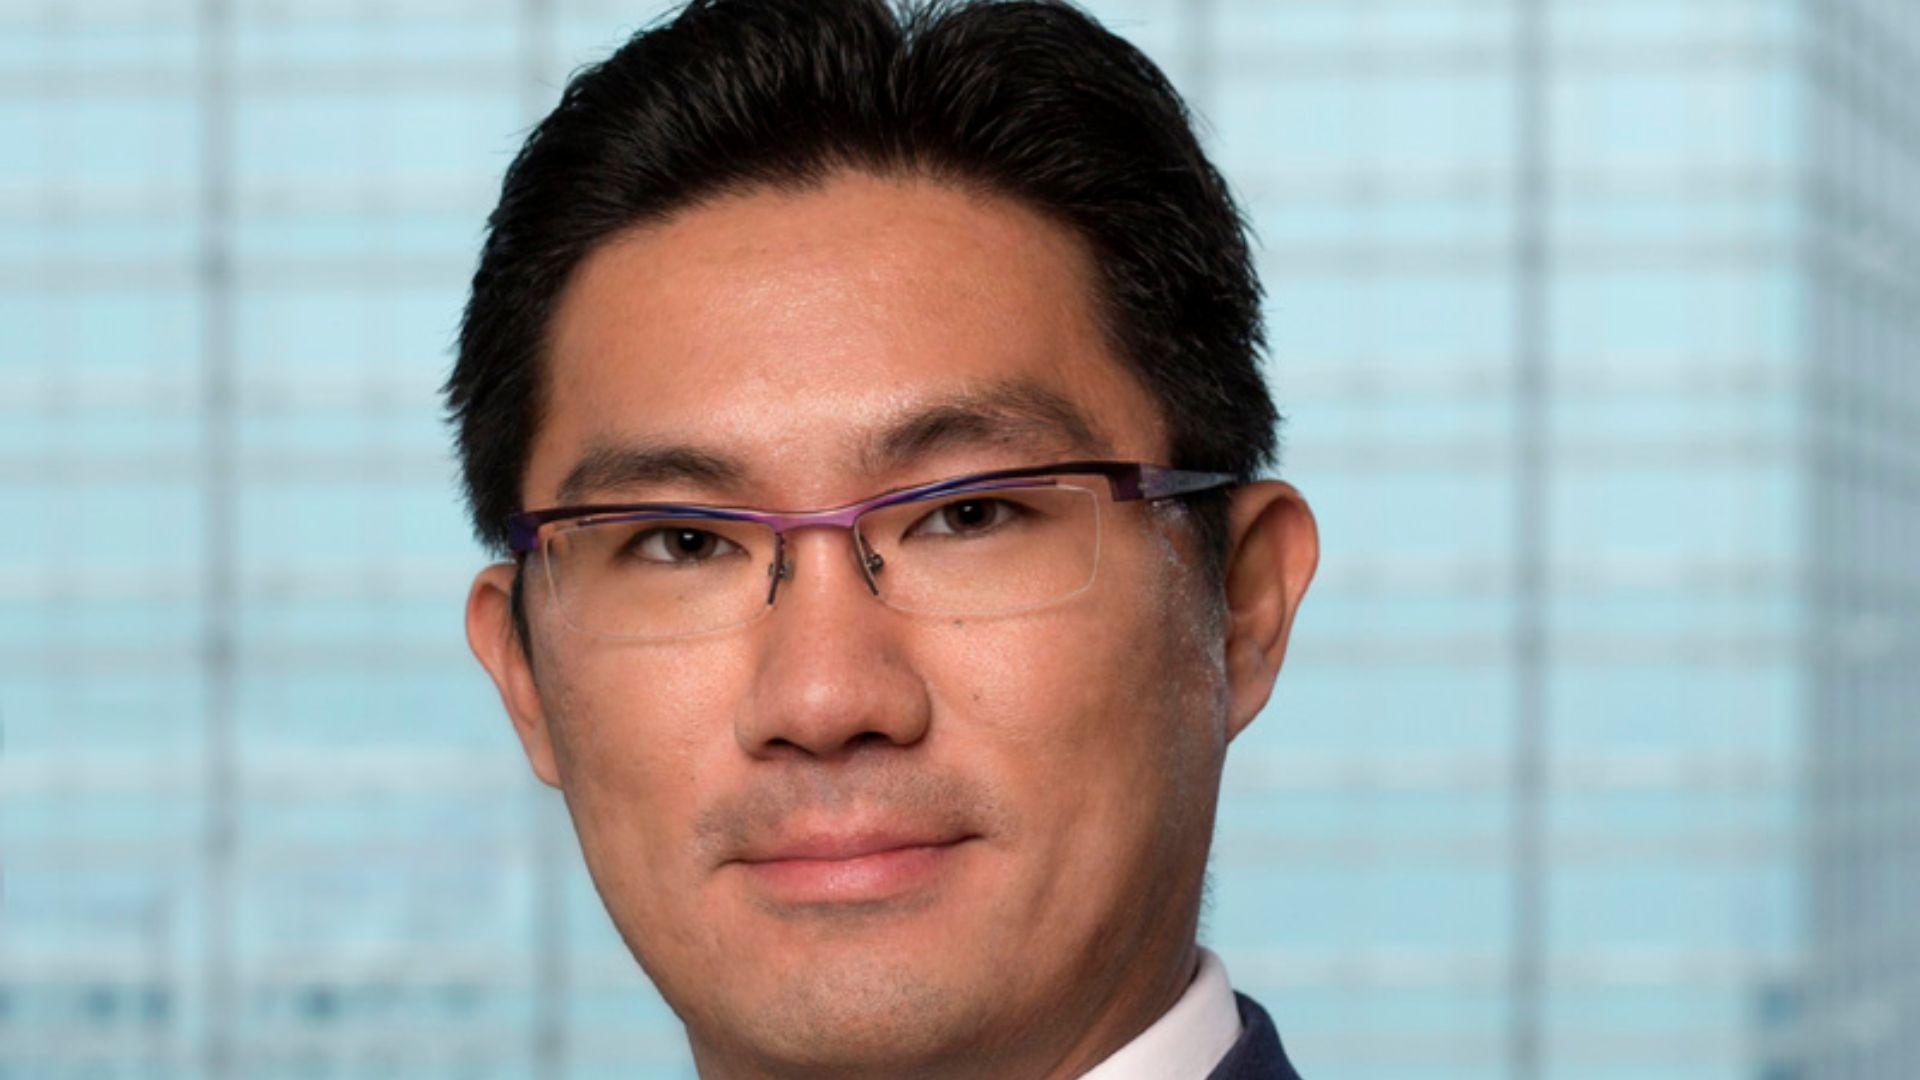 Charles Sturt graduate announced as a finalist in the Australia China Alumni Awards